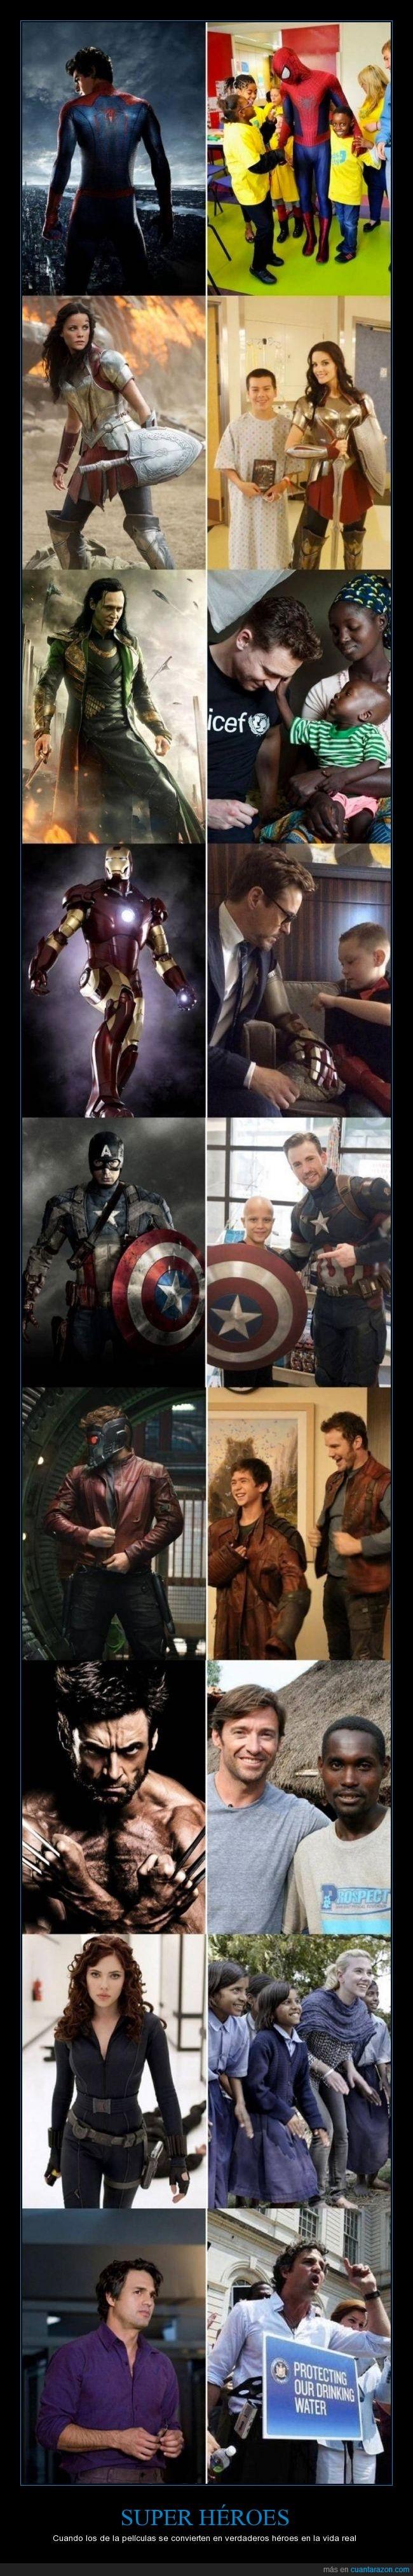 actor,avengers,ayudar,buenas acciones,heores,hospital,hulk,iron man,marvel,spider man,vida real,wolverine